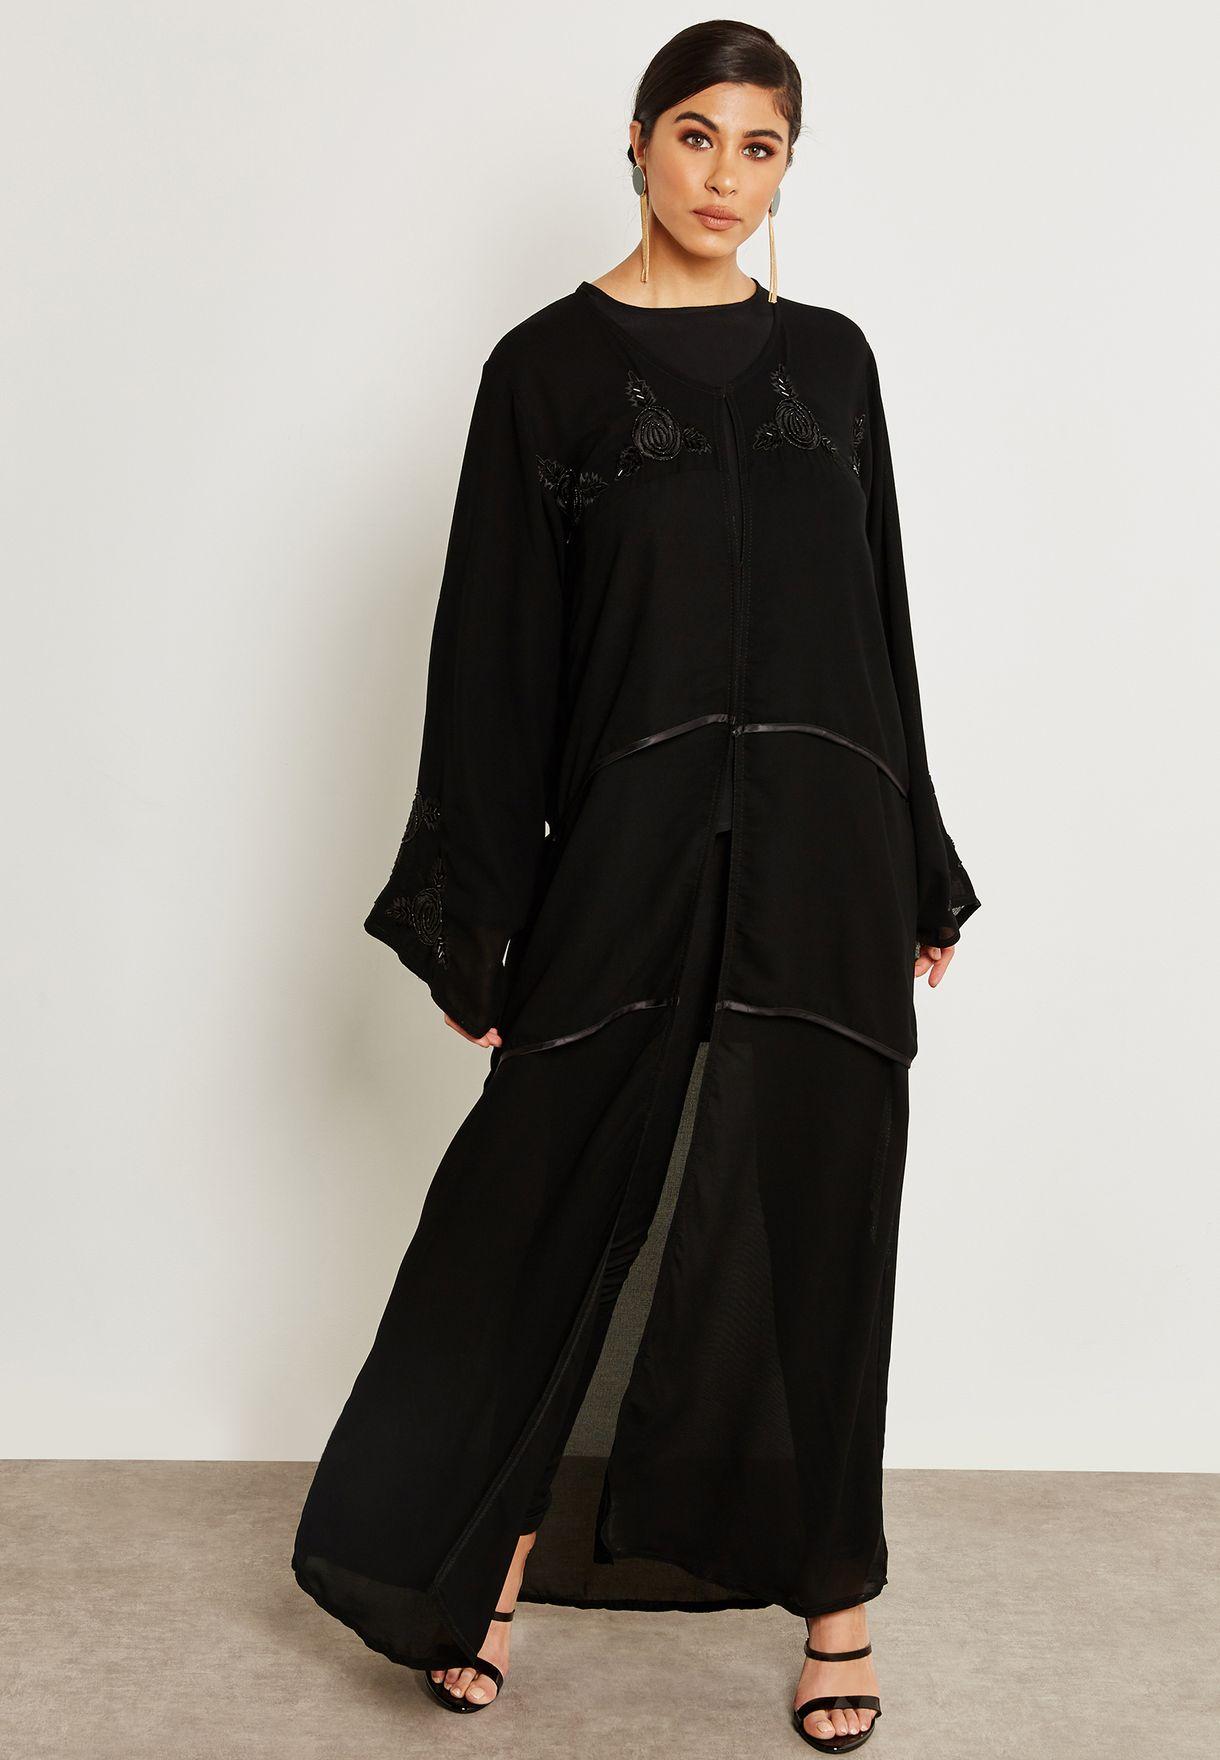 Handwork Top Layered Abaya